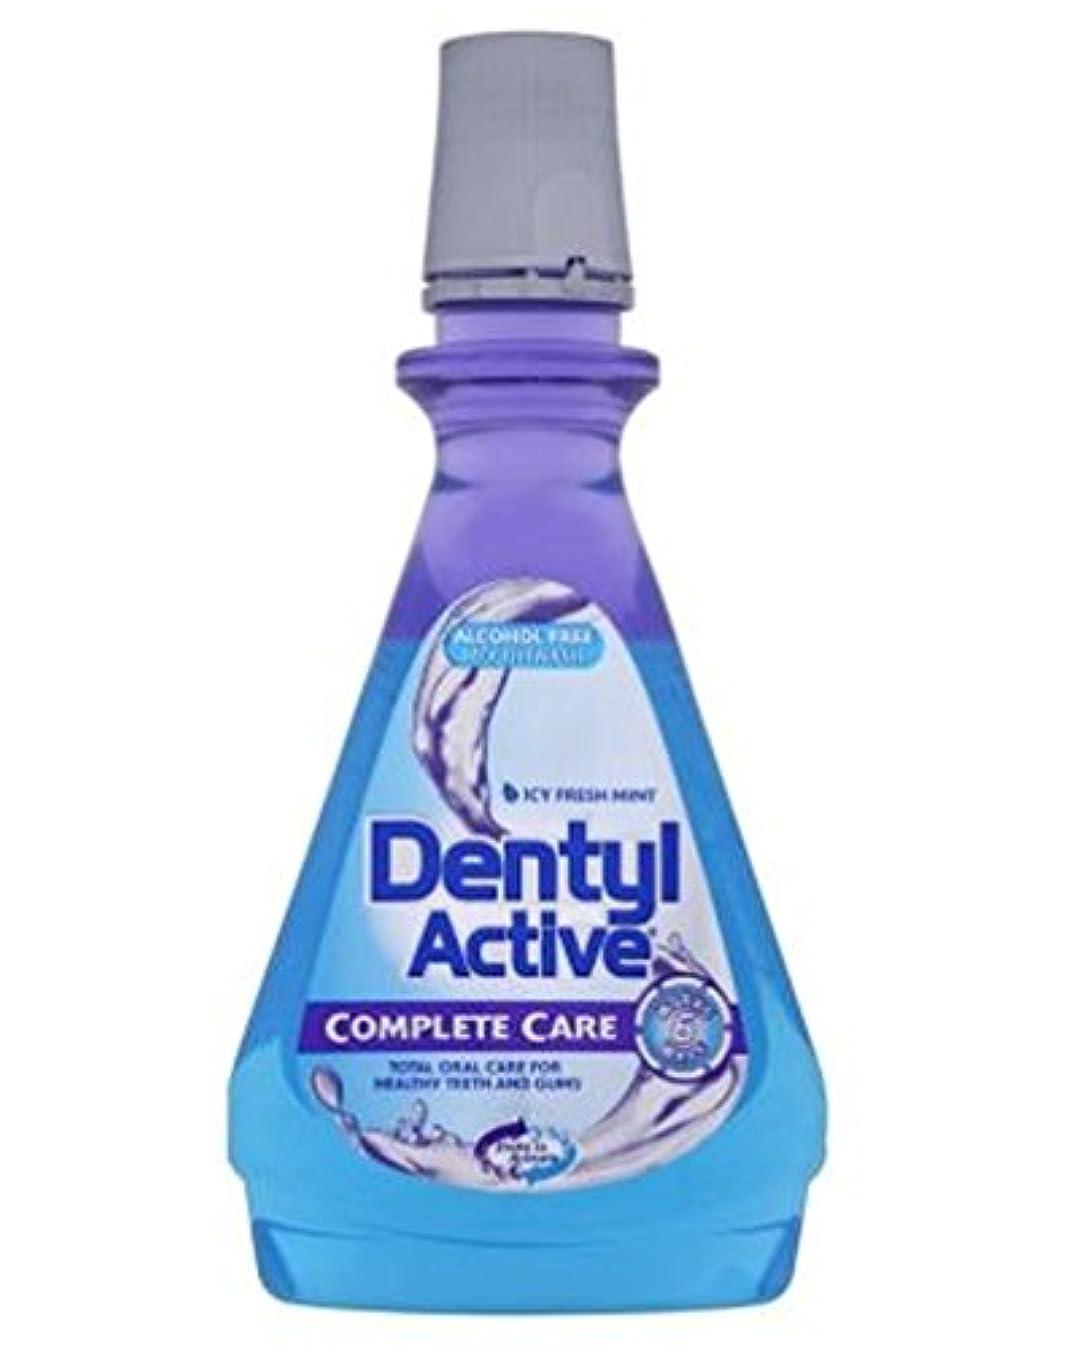 Dentylアクティブケアミントマウスウォッシュ500ミリリットル (Dentyl) (x2) - Dentyl Active Care Mint Mouthwash 500ml (Pack of 2) [並行輸入品]